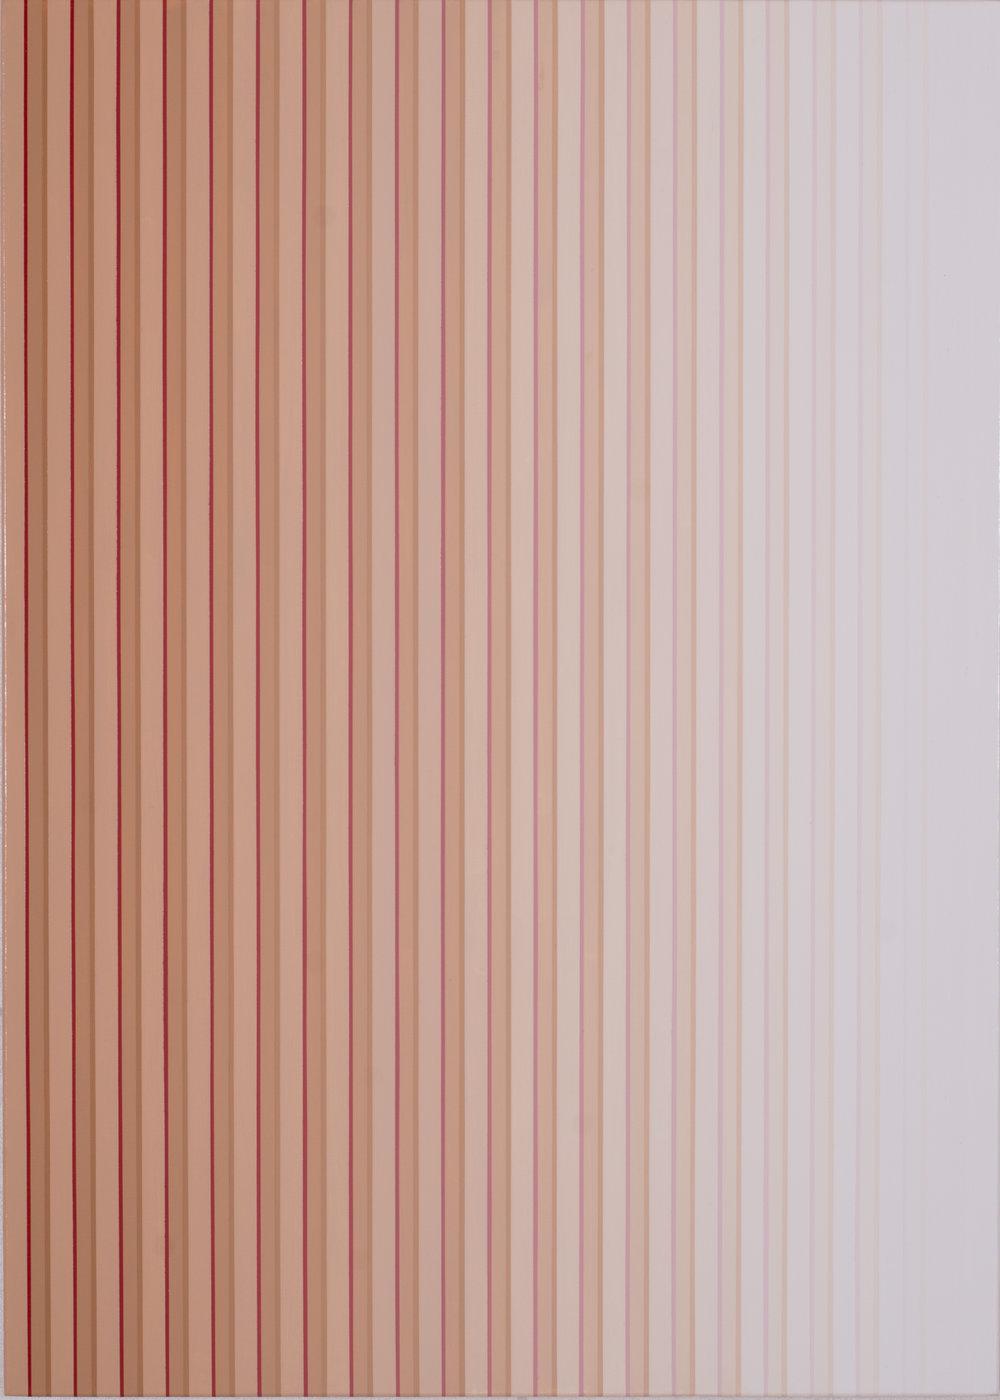 Miok Chung, Transition 1601 ,91x65cm, acrylic on canvas, 2016